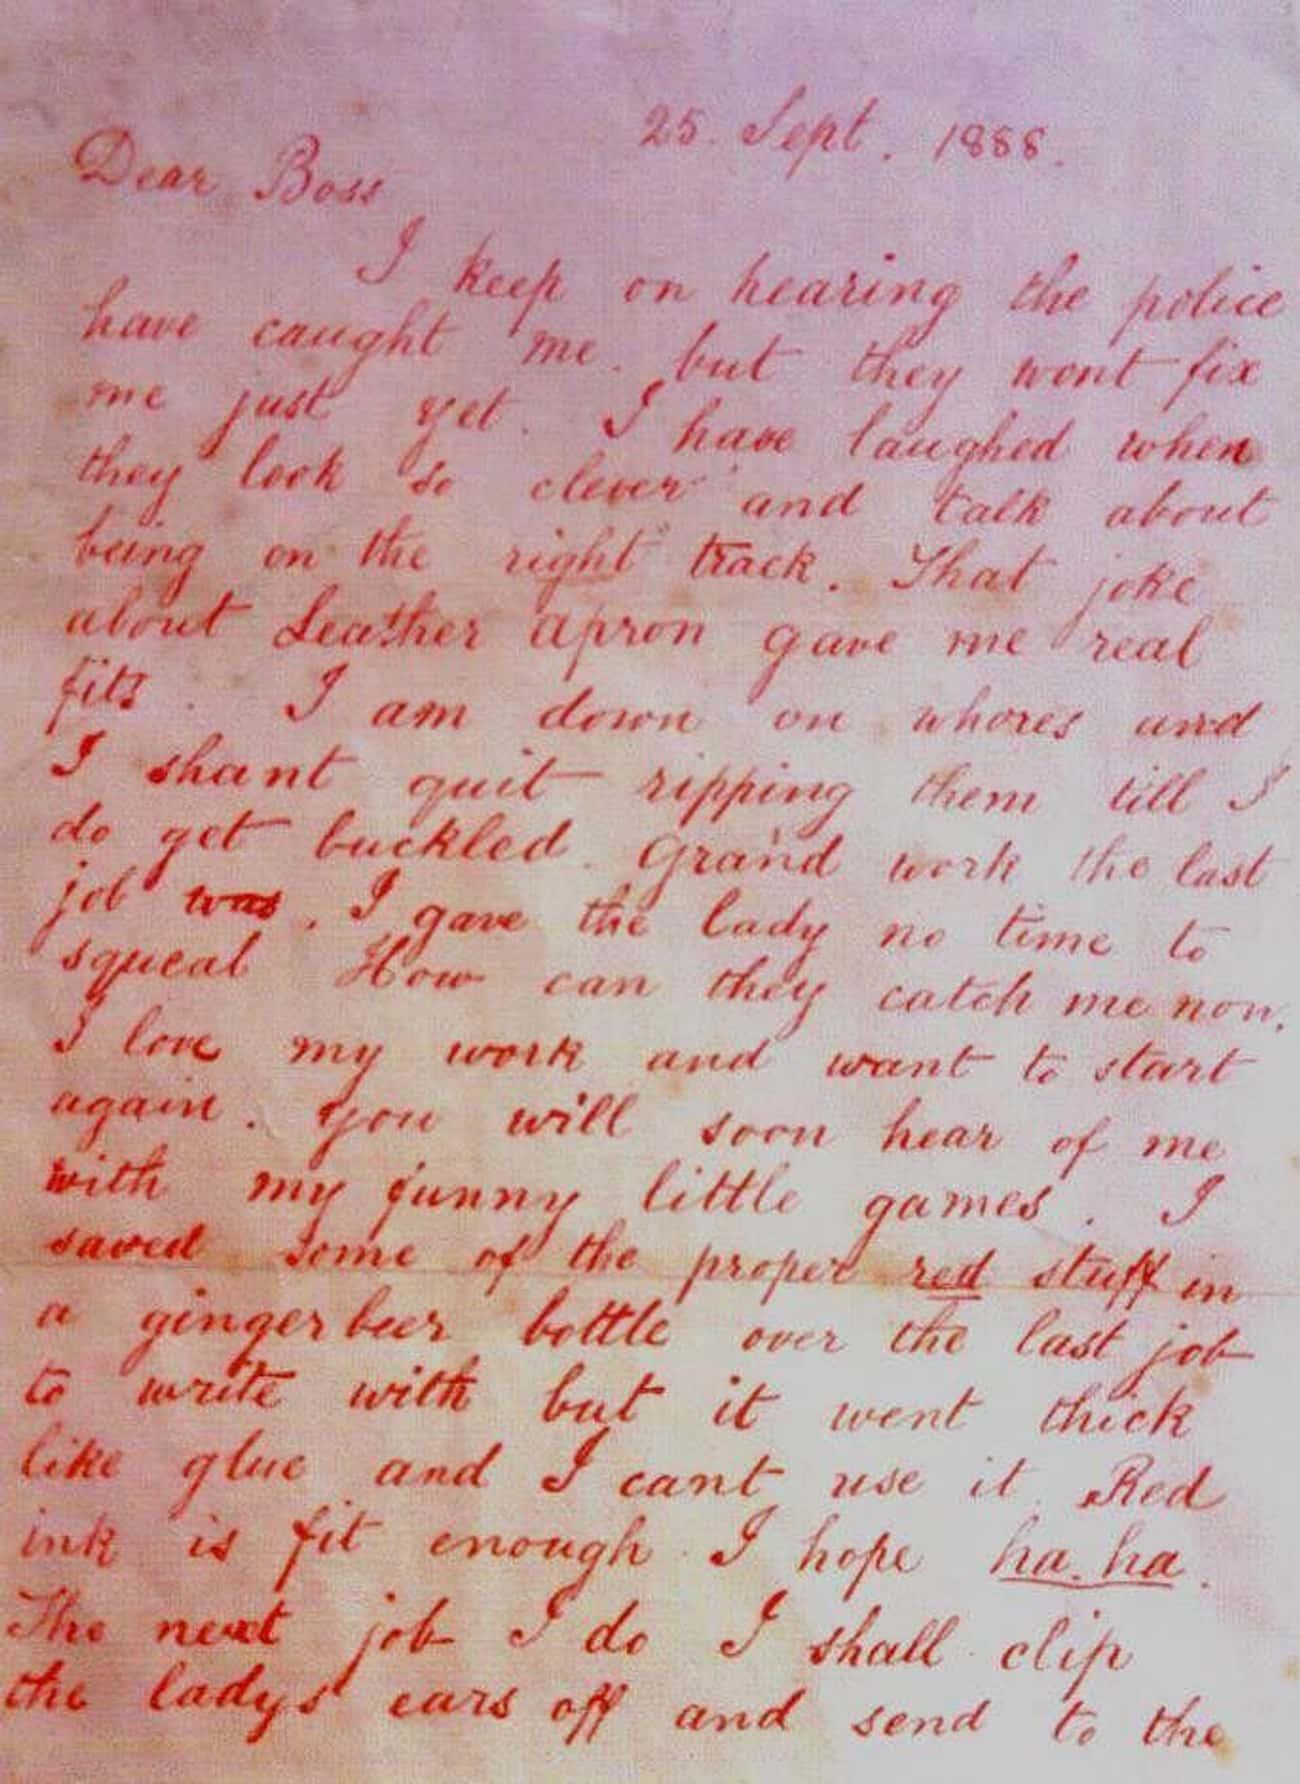 Handwriting Analysis Links The Two Killers